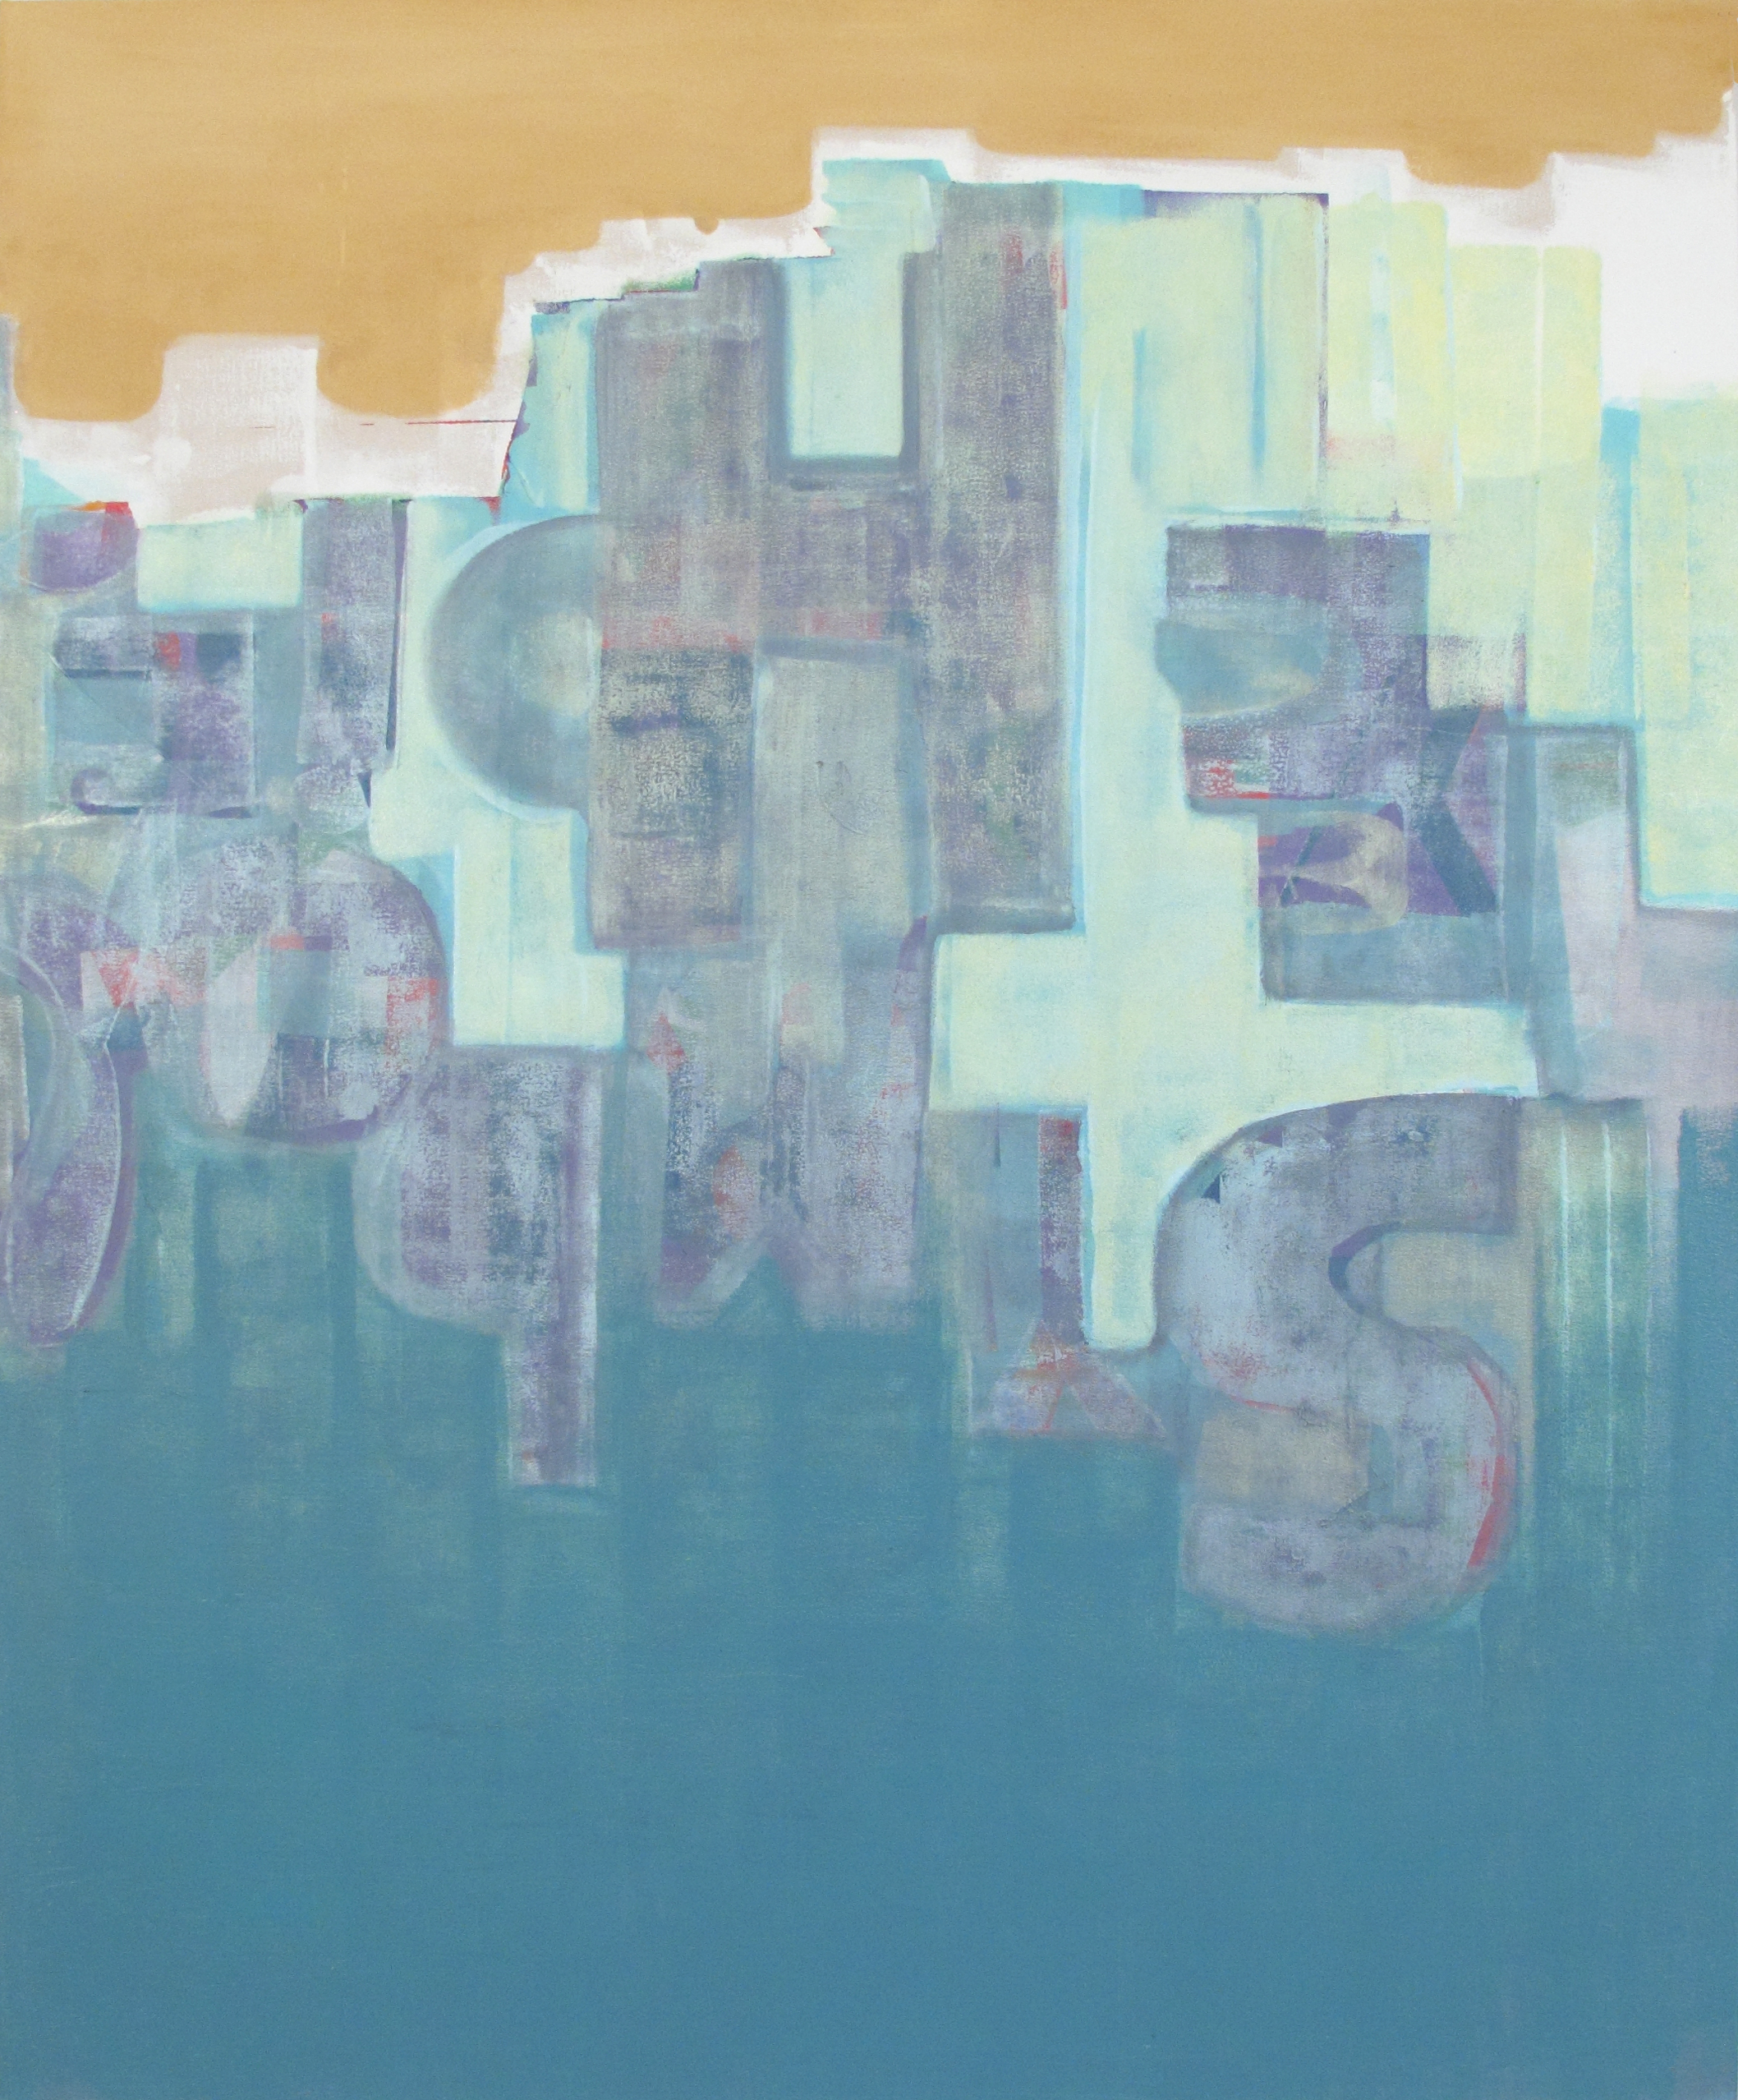 Symbolic choices, 2011